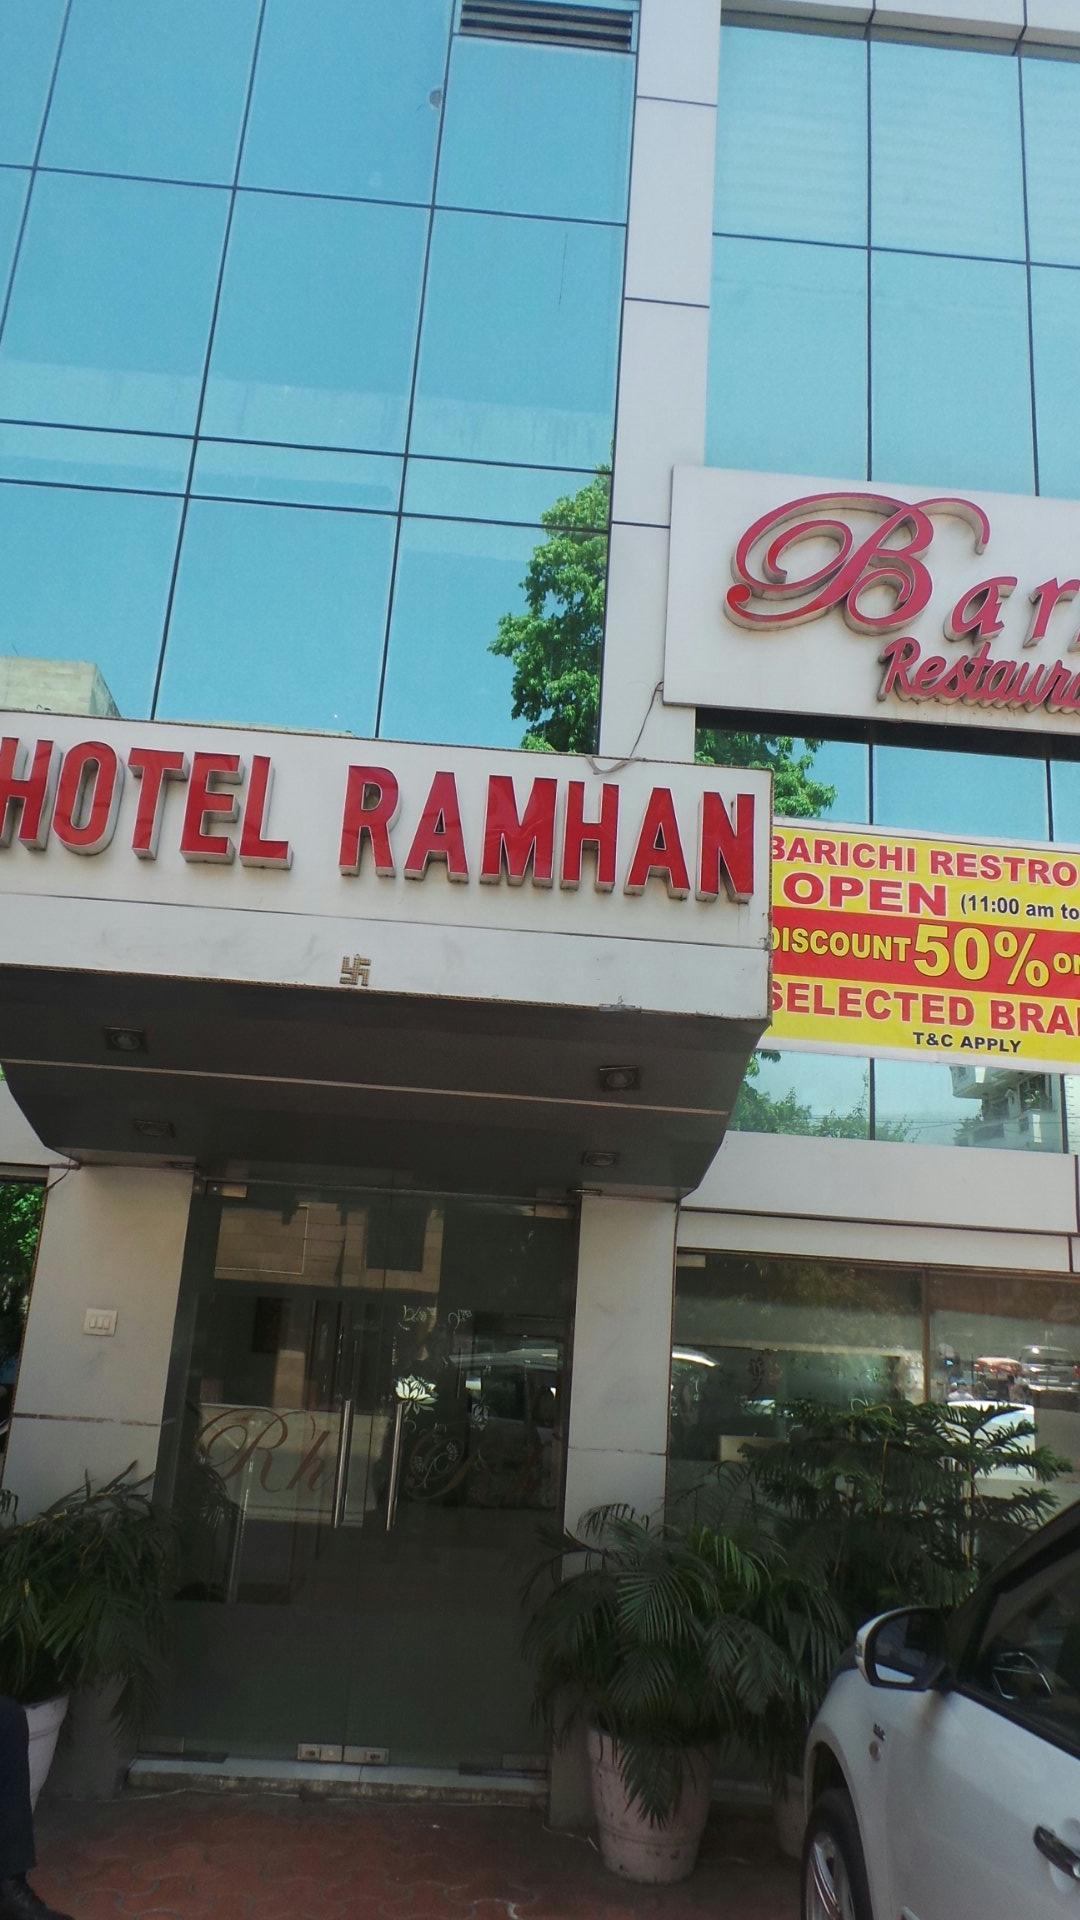 Ramhan Hotel in New Delhi